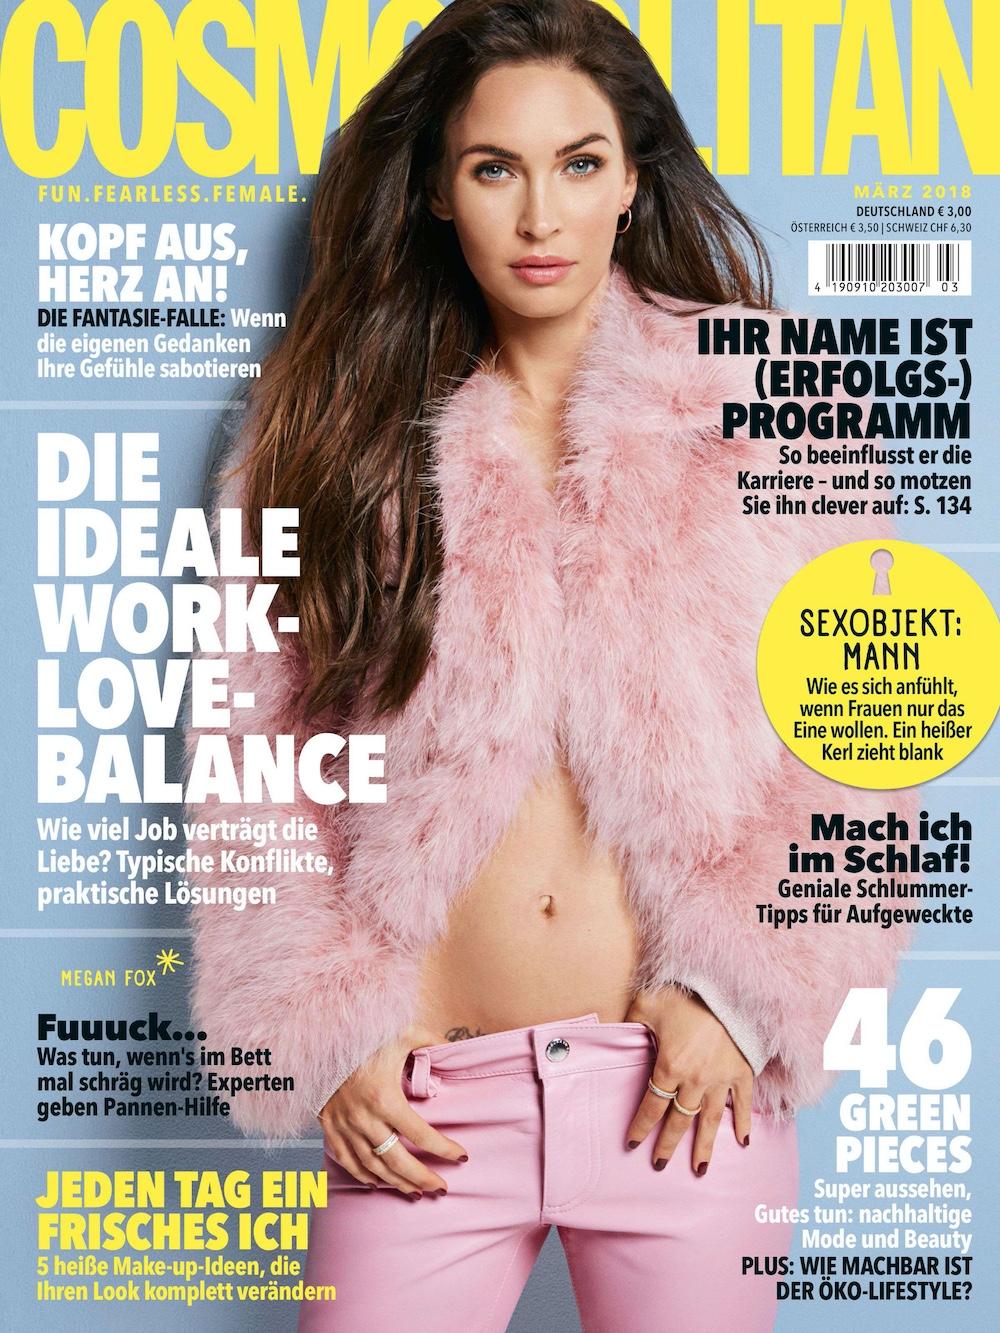 Cosmopolitan 2018-03